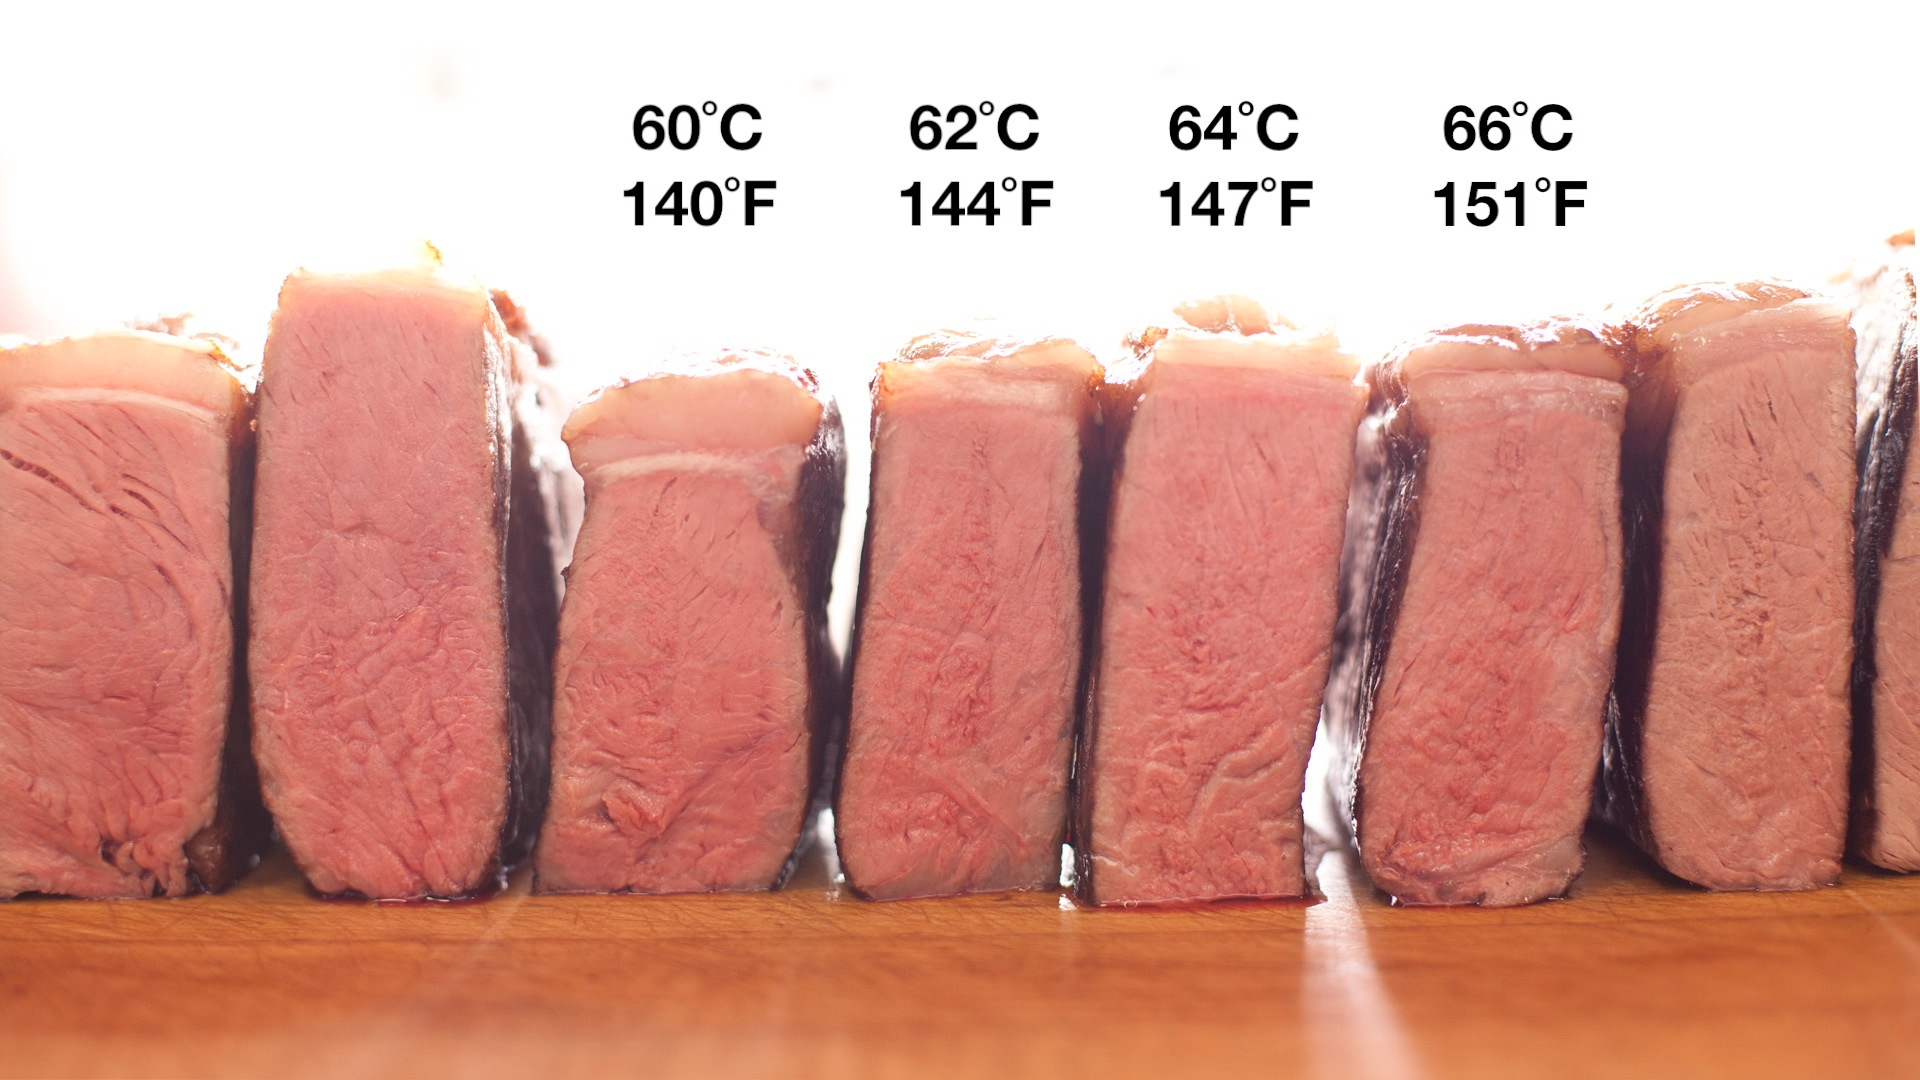 vide steak recipe chefsteps sous vide steak recipe sous vide goat loin ...